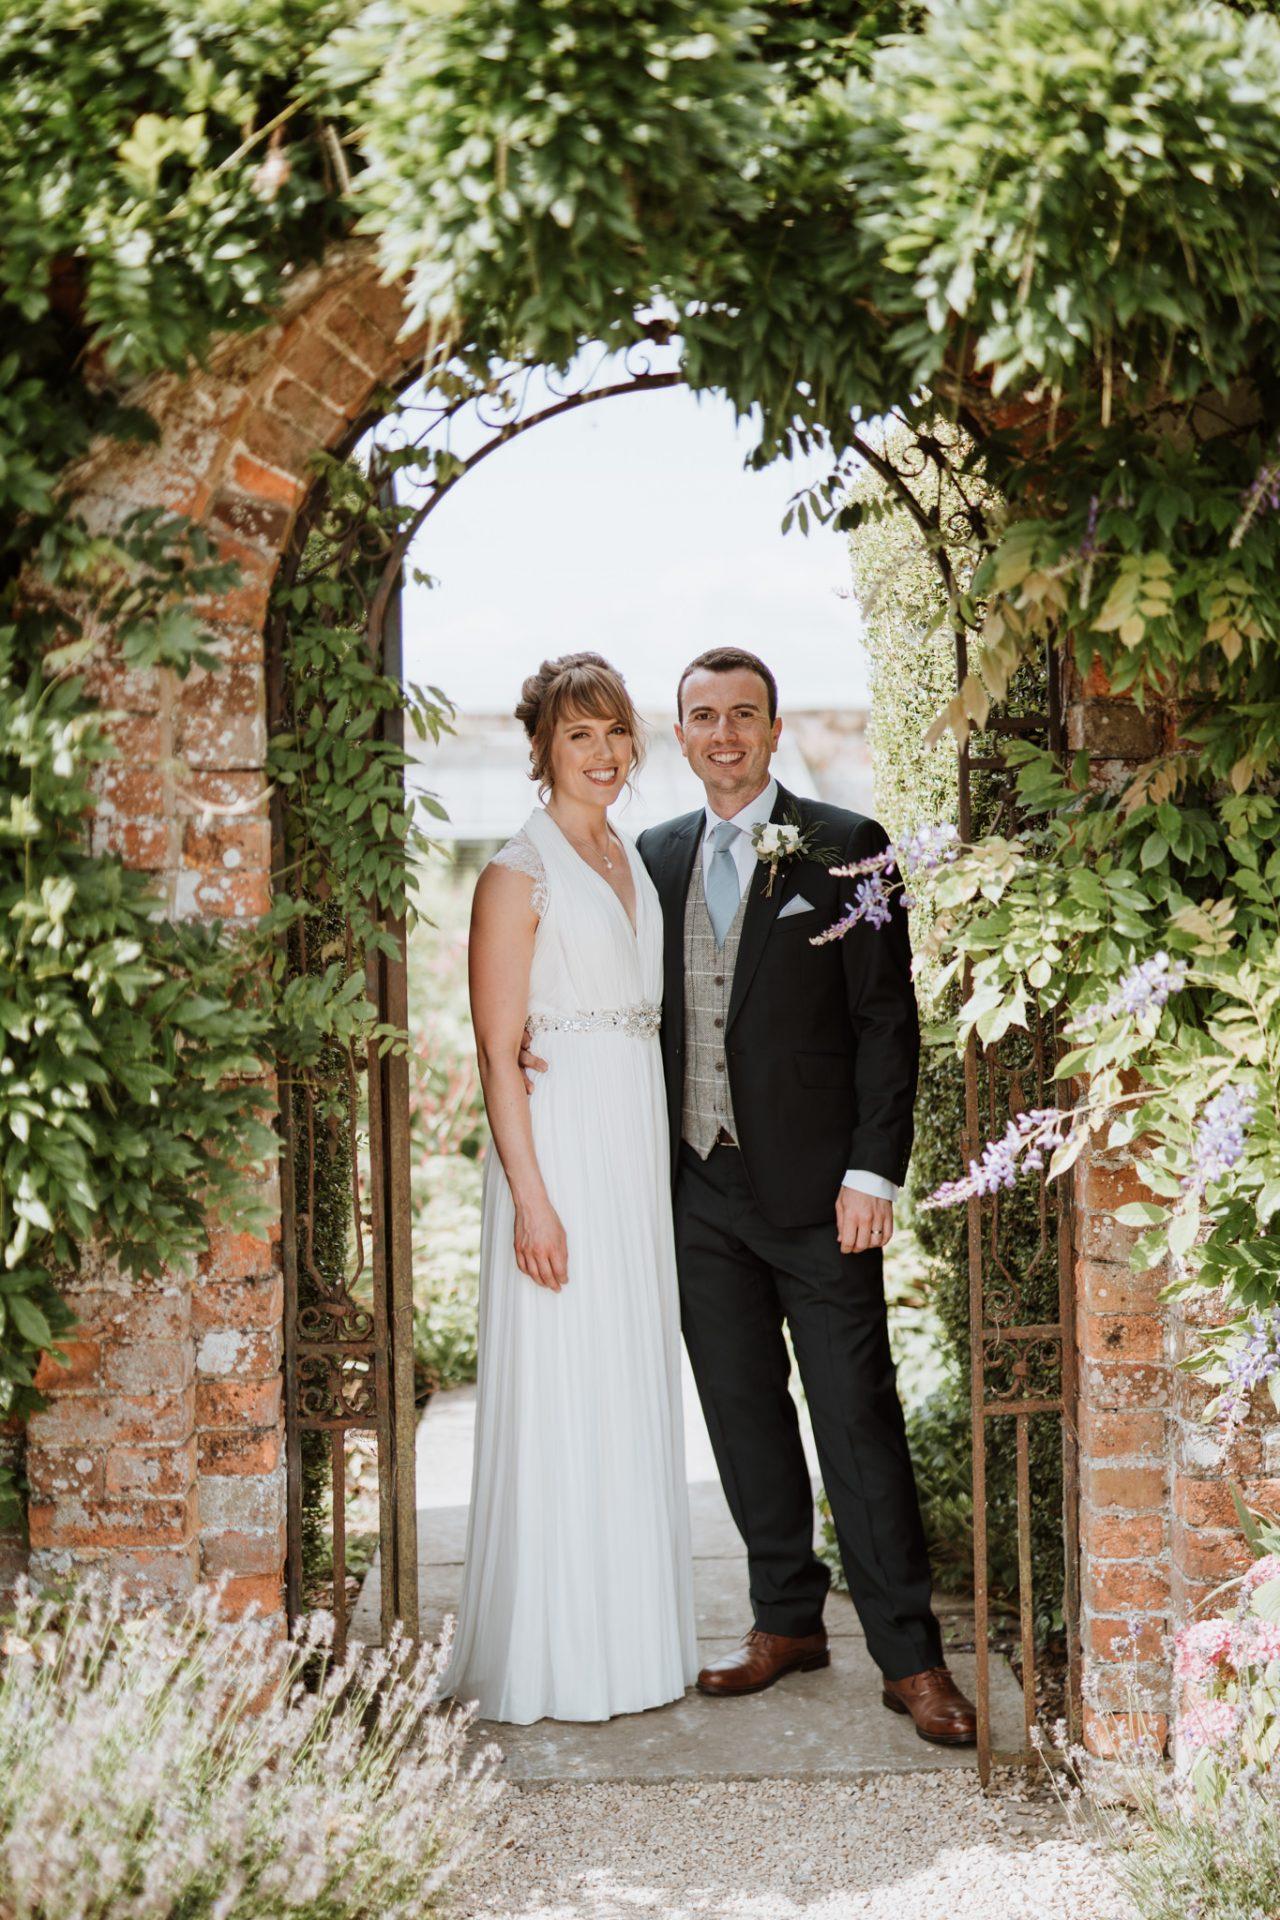 bride and groom smile camera under wisteria archway